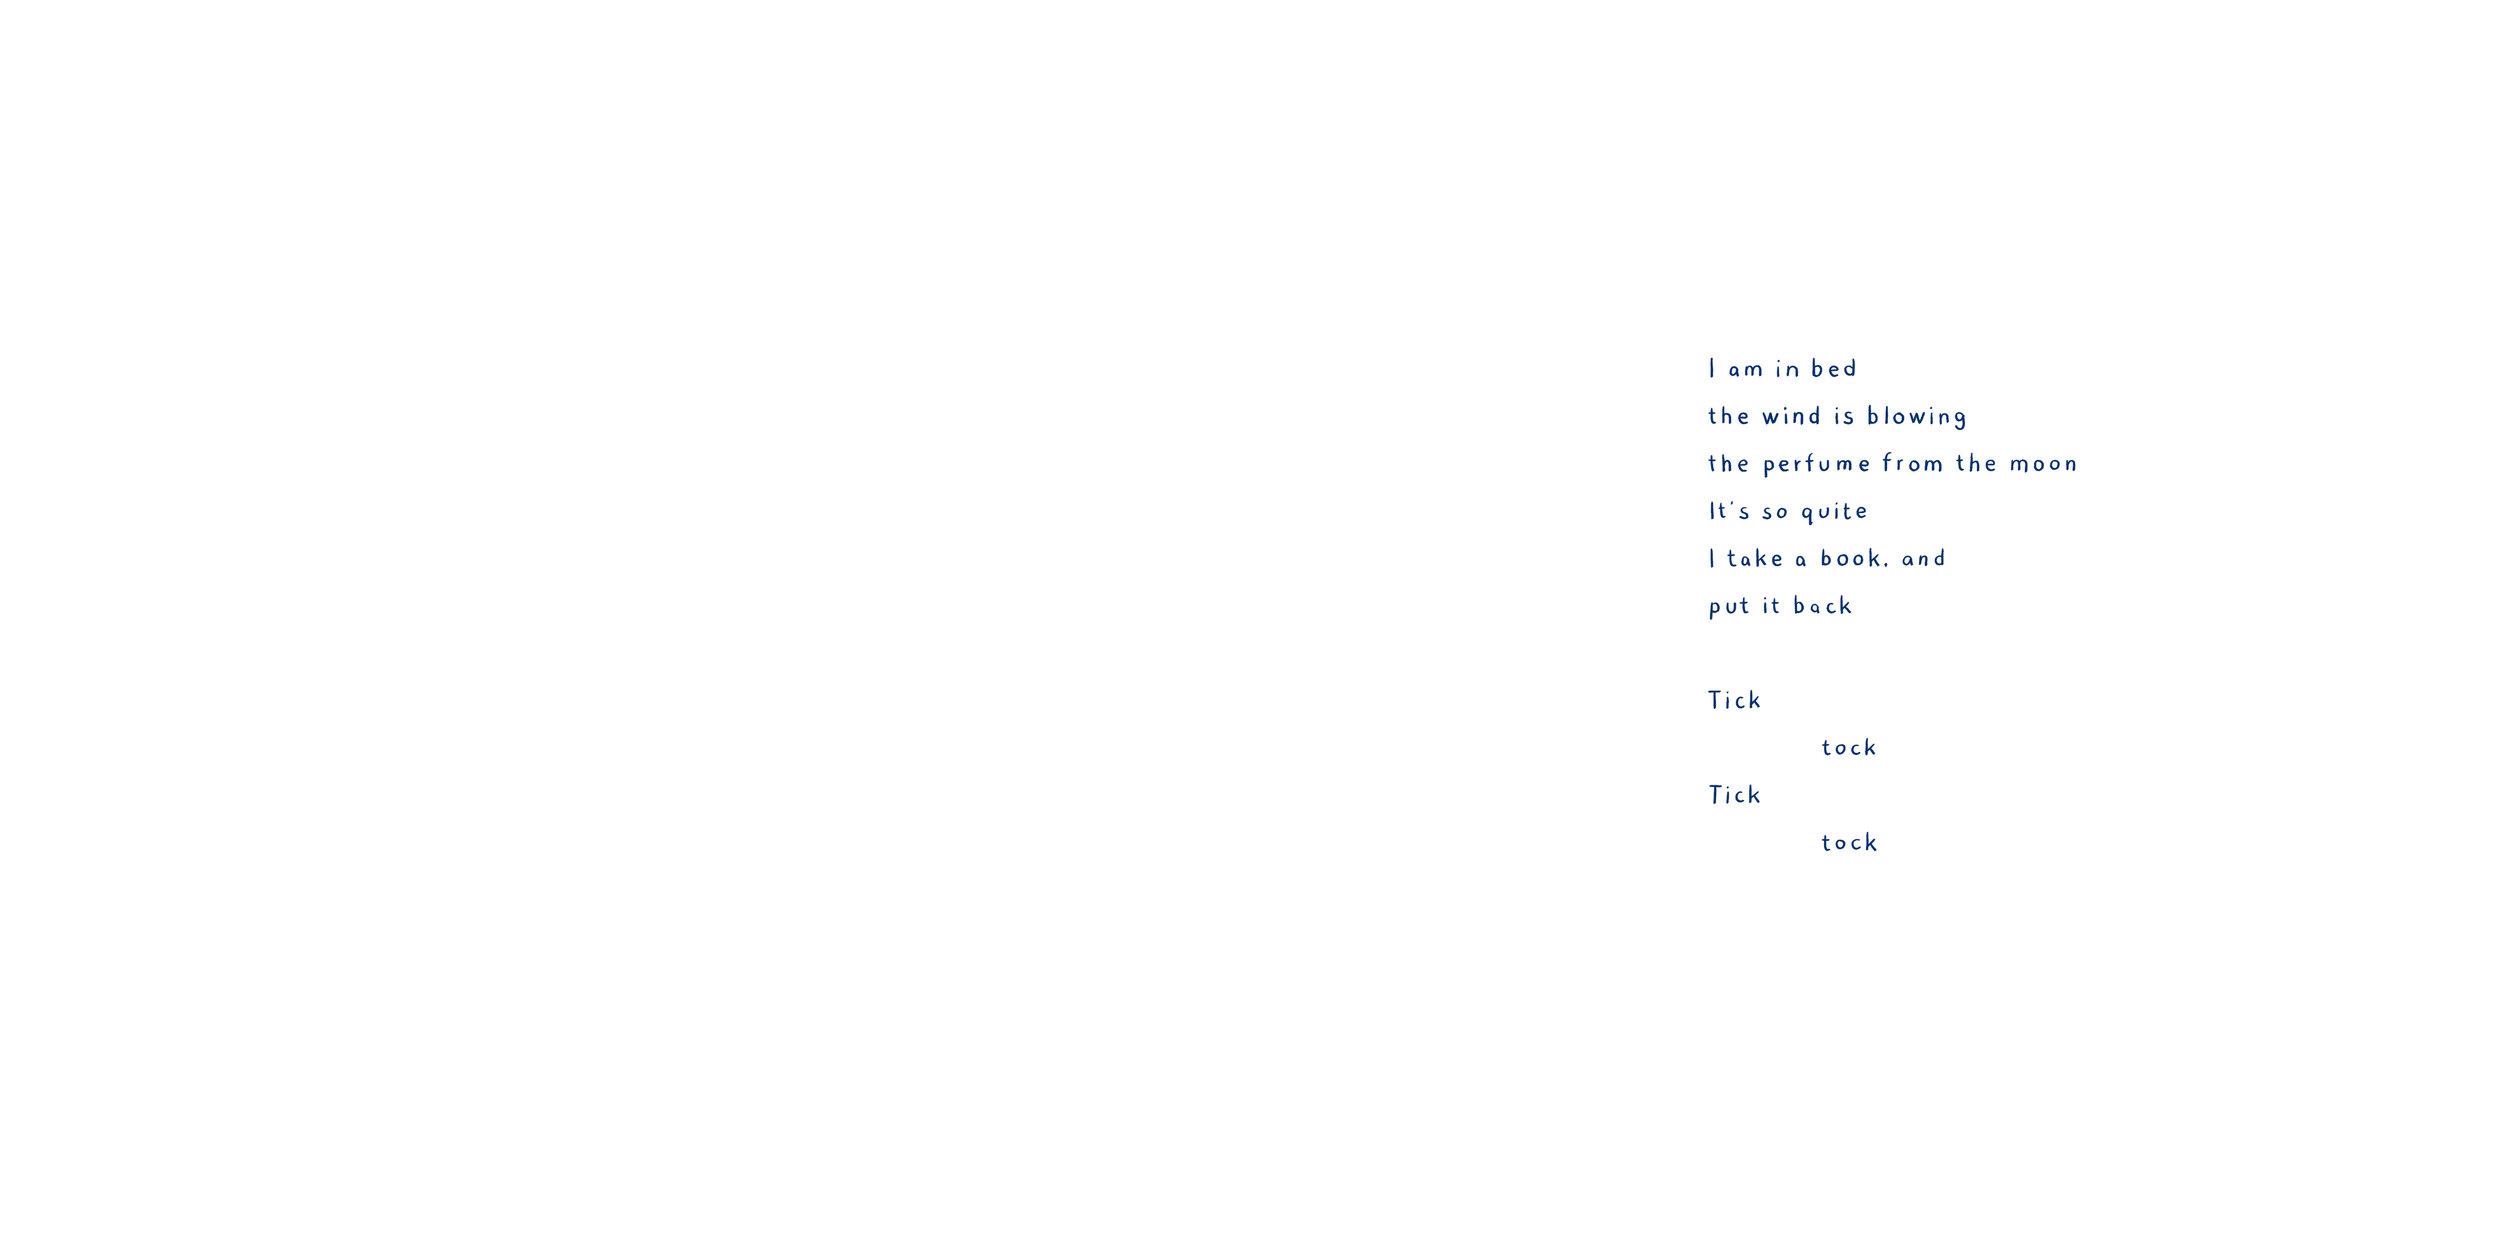 astro airline poem page.jpg